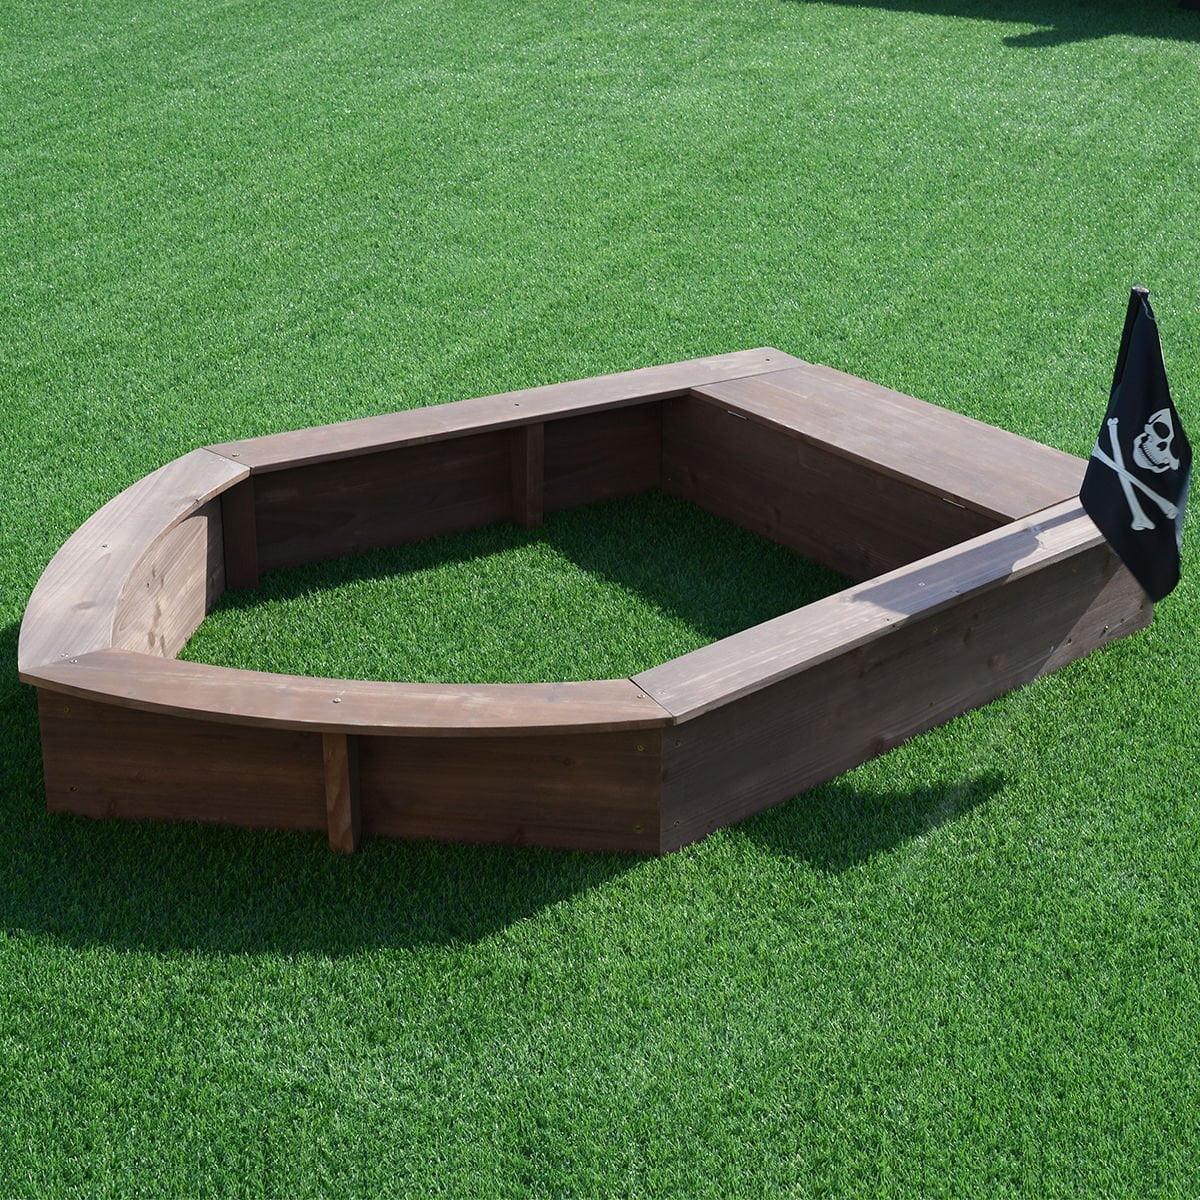 New MTN-G Beach Toy Sandboat Captain Series Cedar Sandbox Kids with Bench Seat and Flag